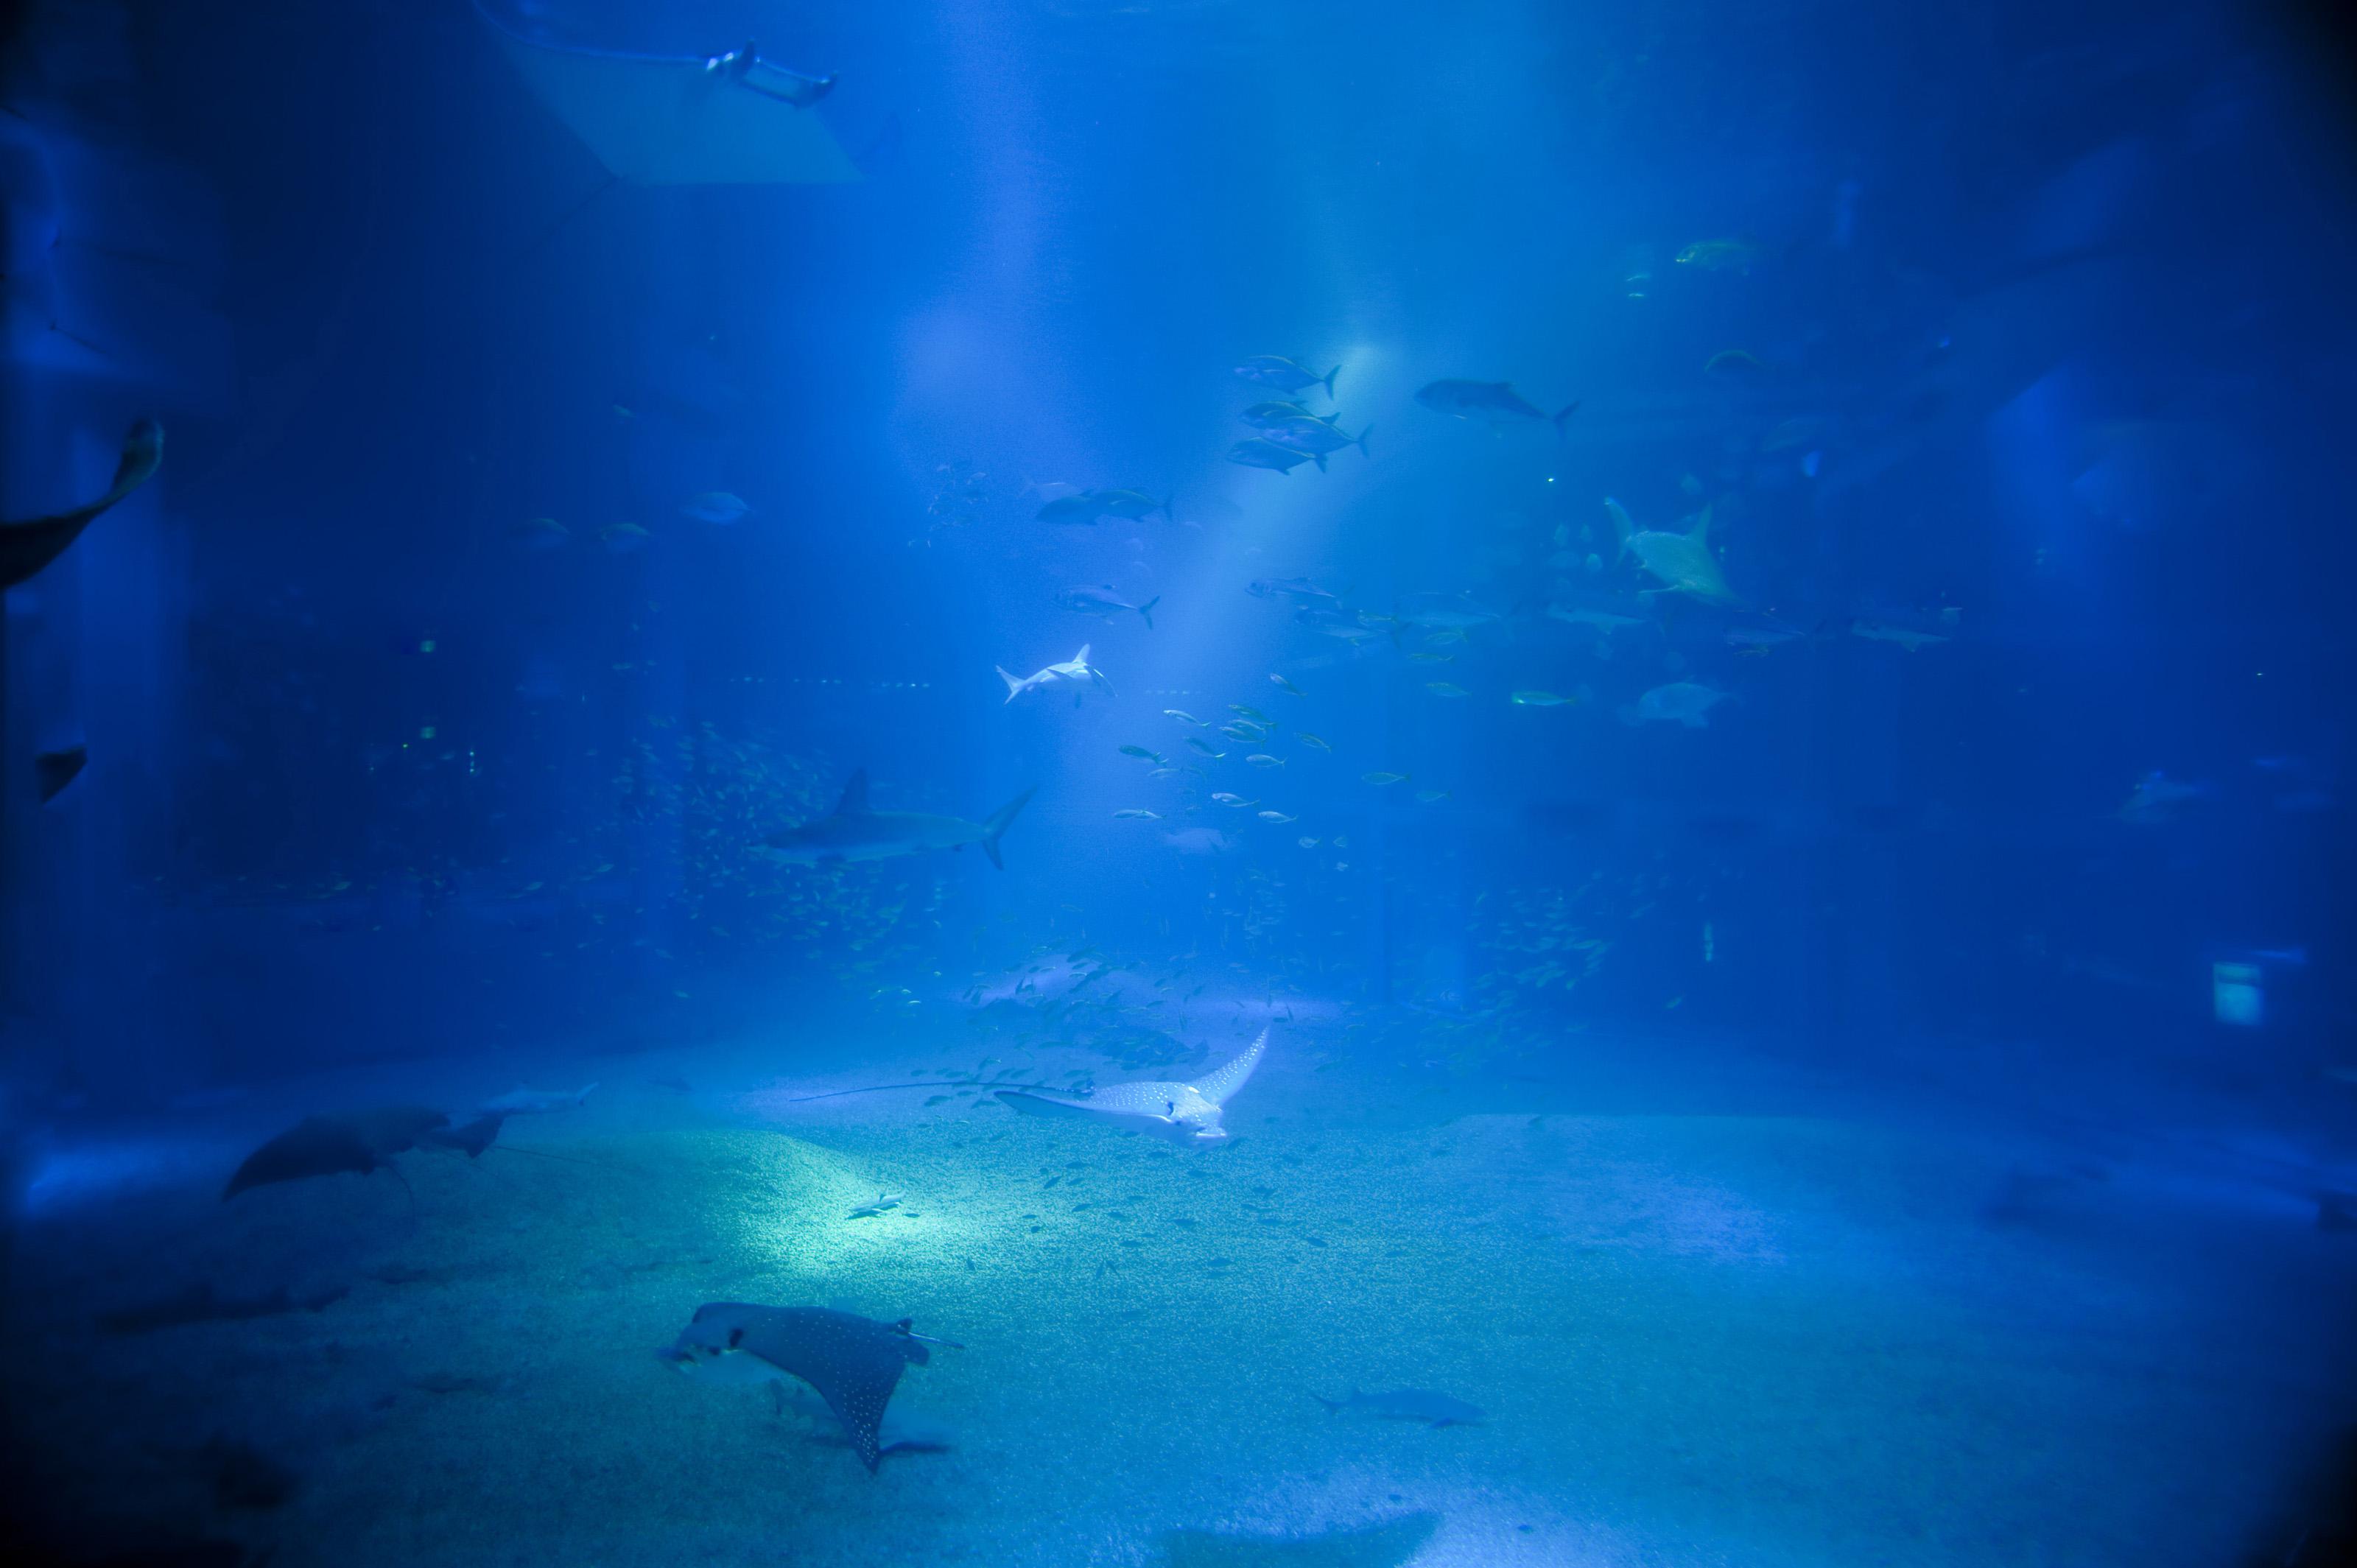 3d Fish Tank Wallpaper Deep Blue Sea 6716 Stockarch Free Stock Photos